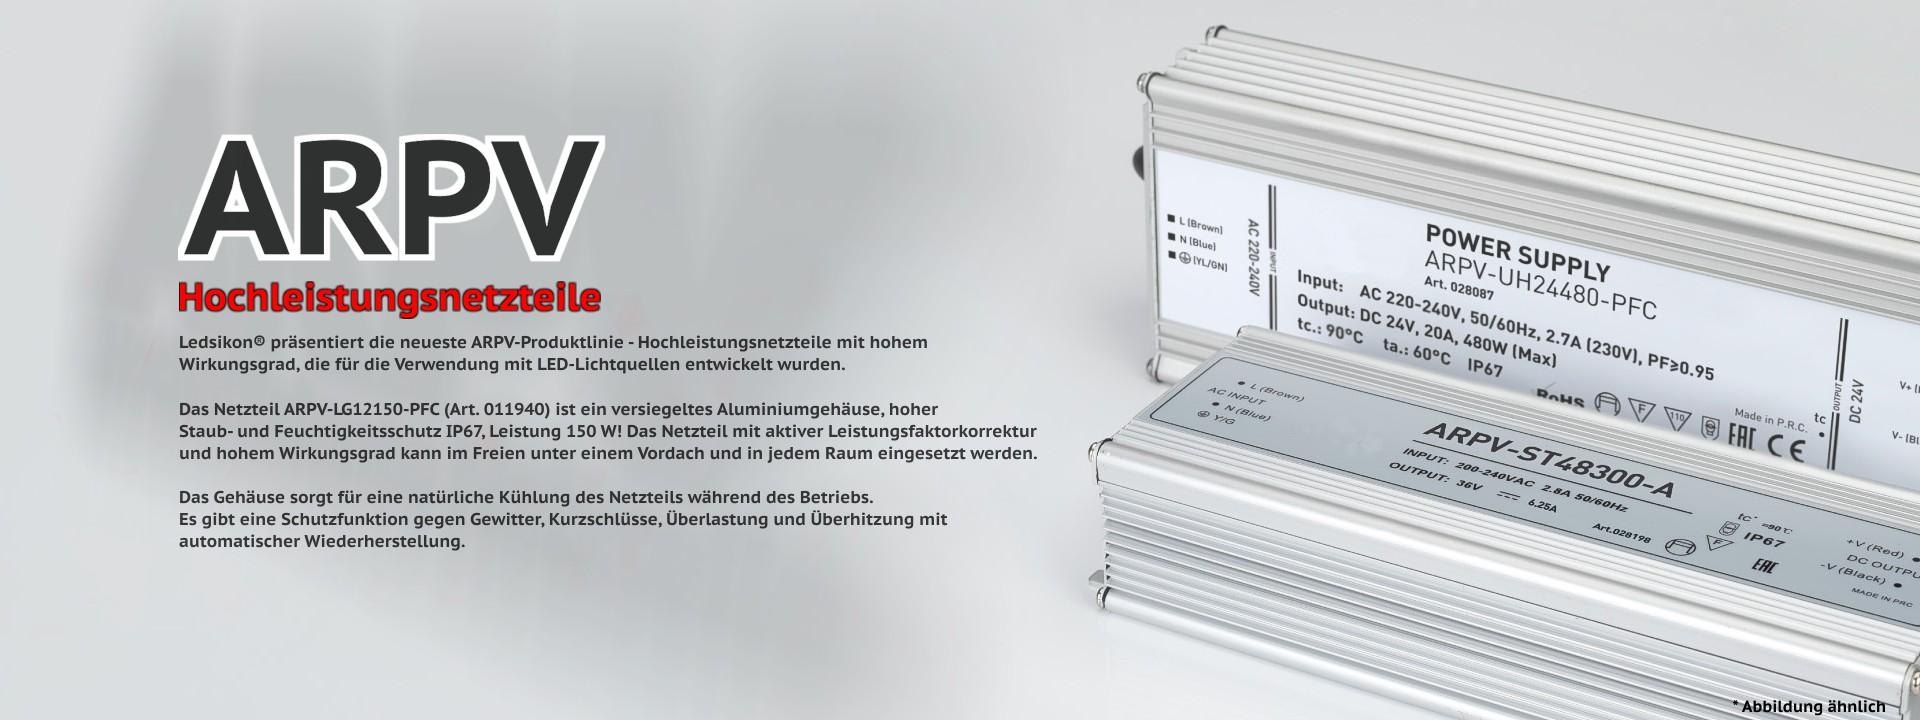 Netzteil ARPV-LG12150 (12V, 12.5A, 150W, PFC) IP67